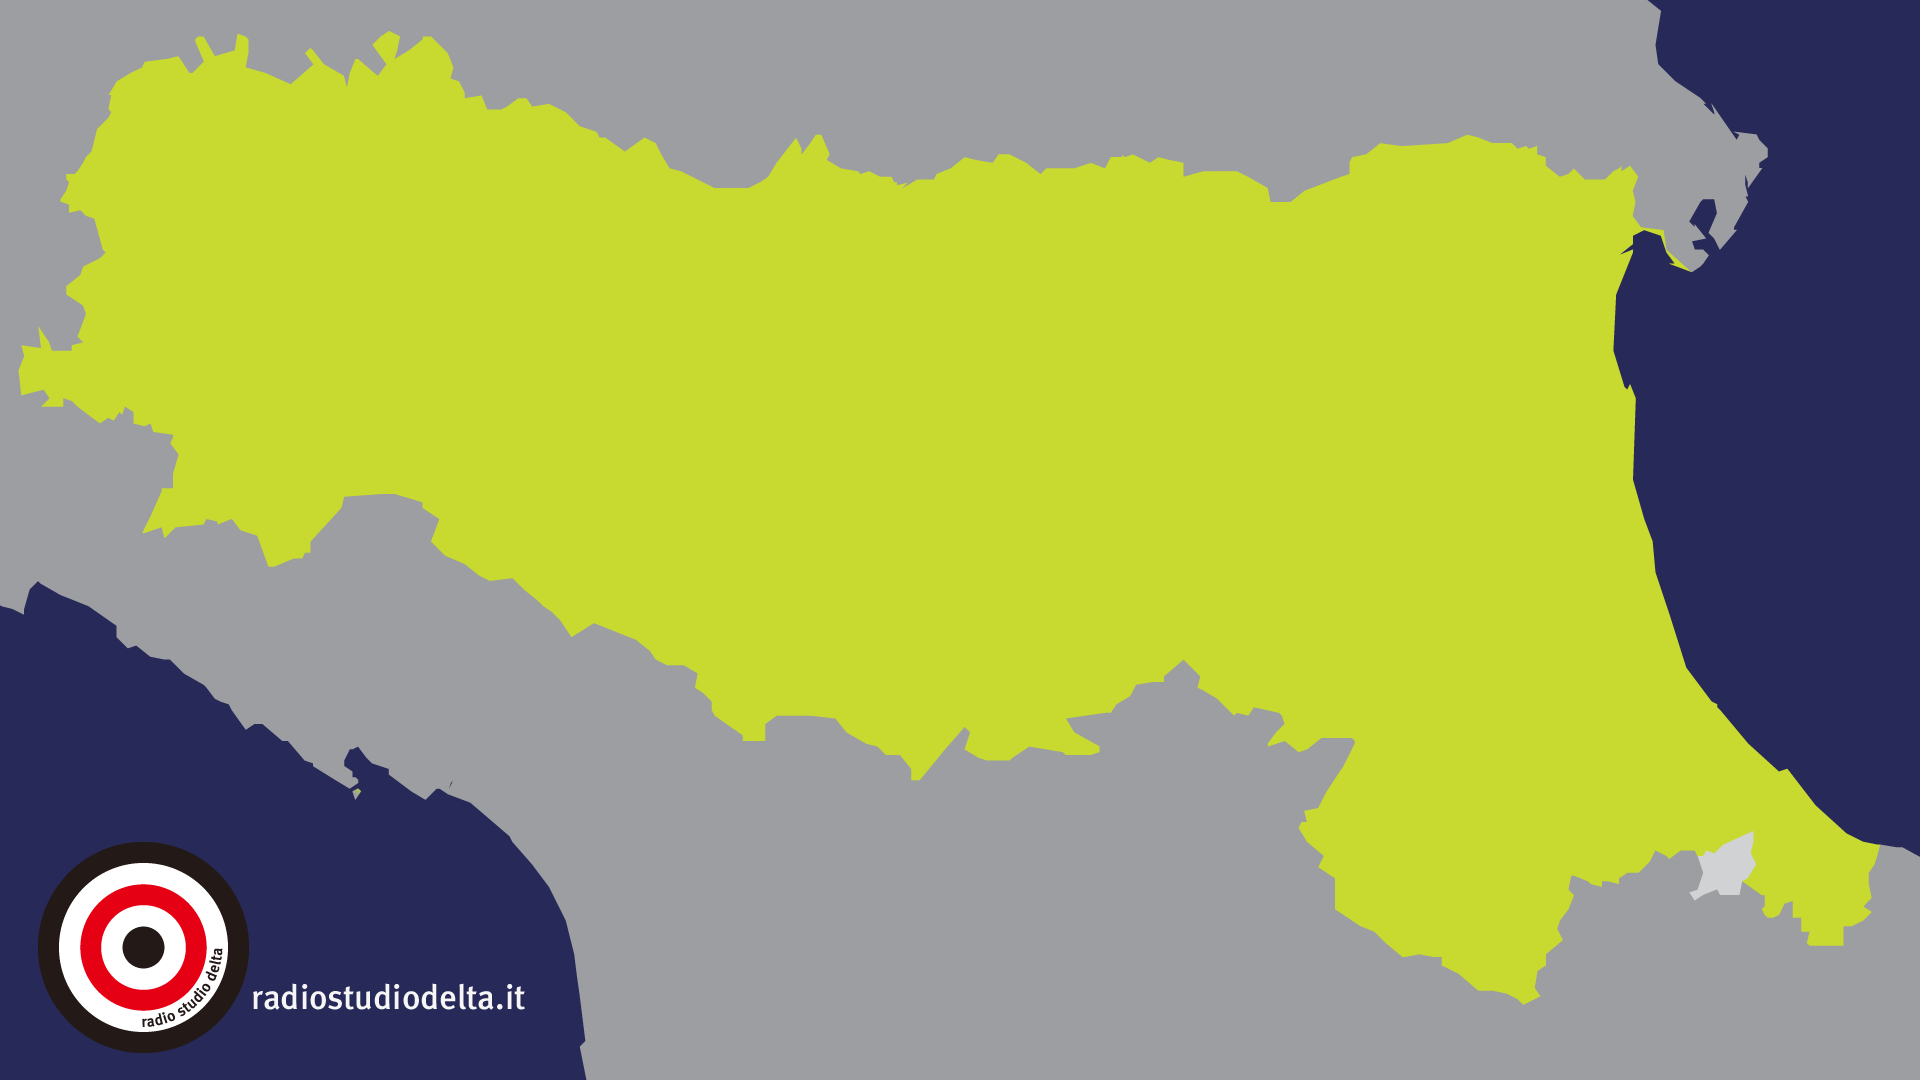 Situazione Meteo in Emilia-Romagna